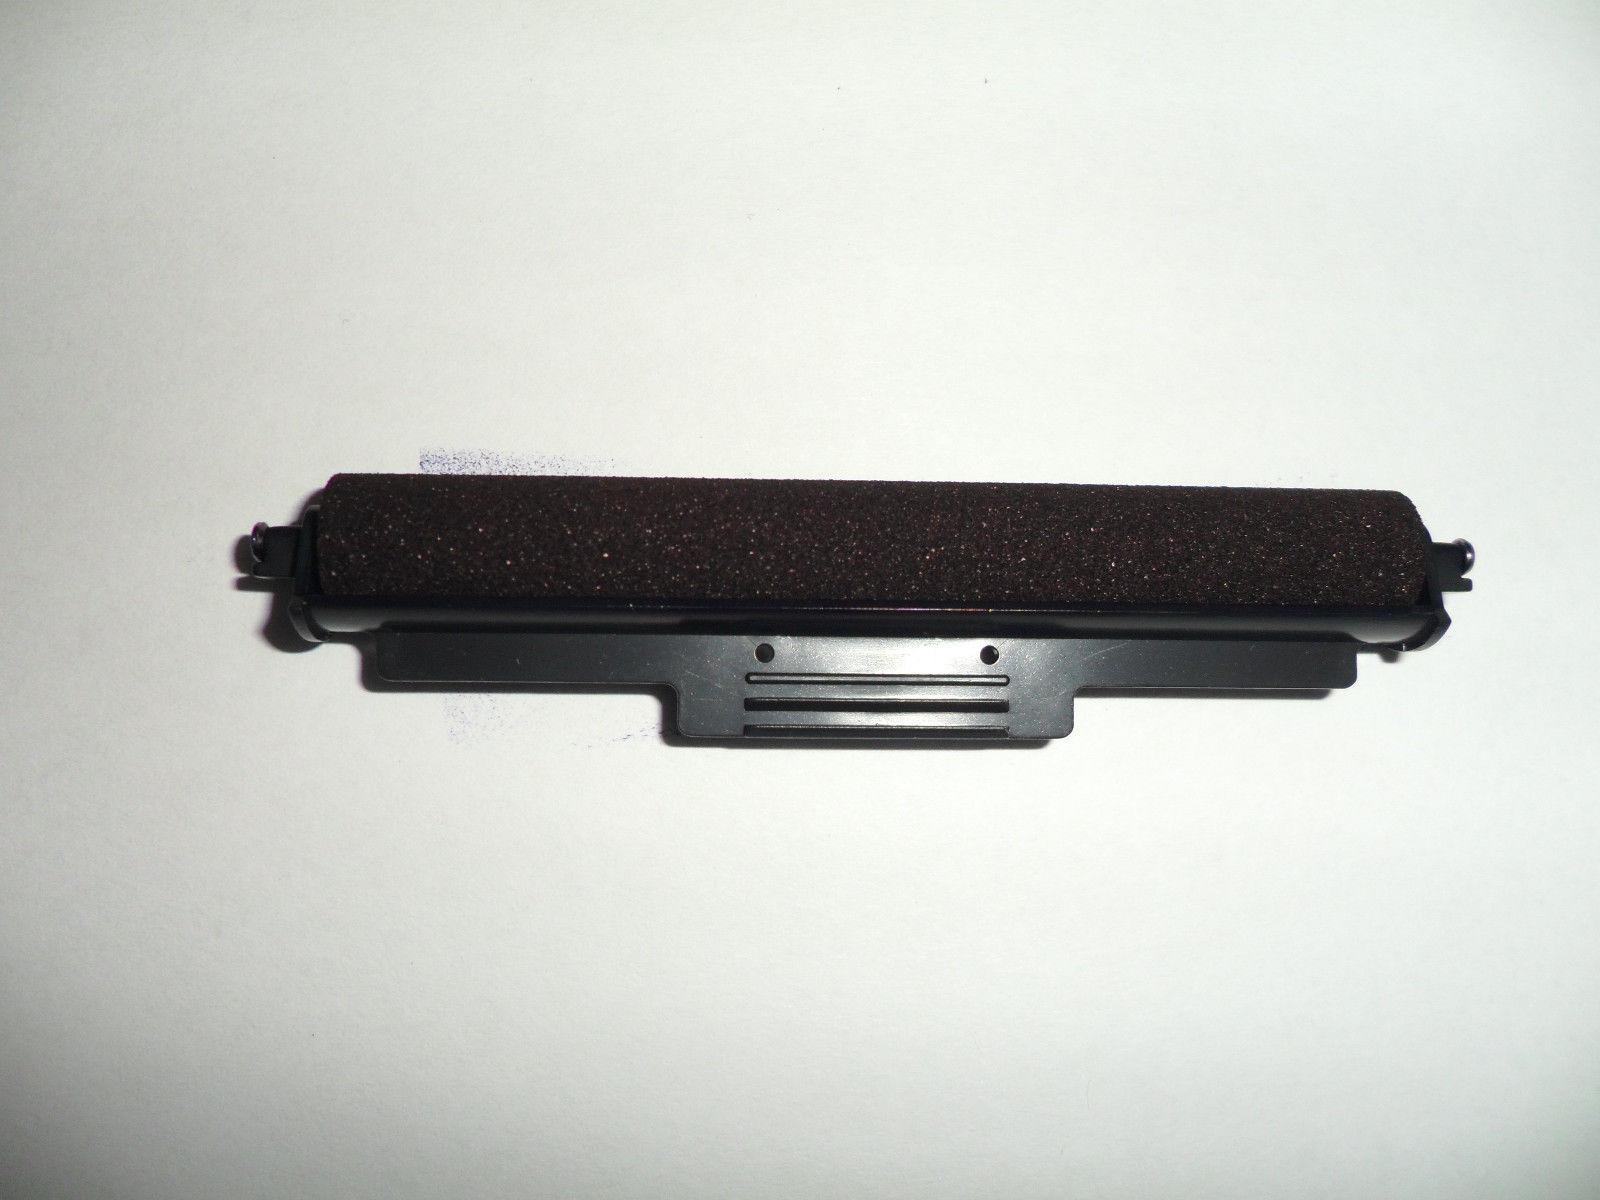 Epson CR510/CR700/CR750/CR760 Cash Register Ink Roller (2 Pack) IR93 NR104